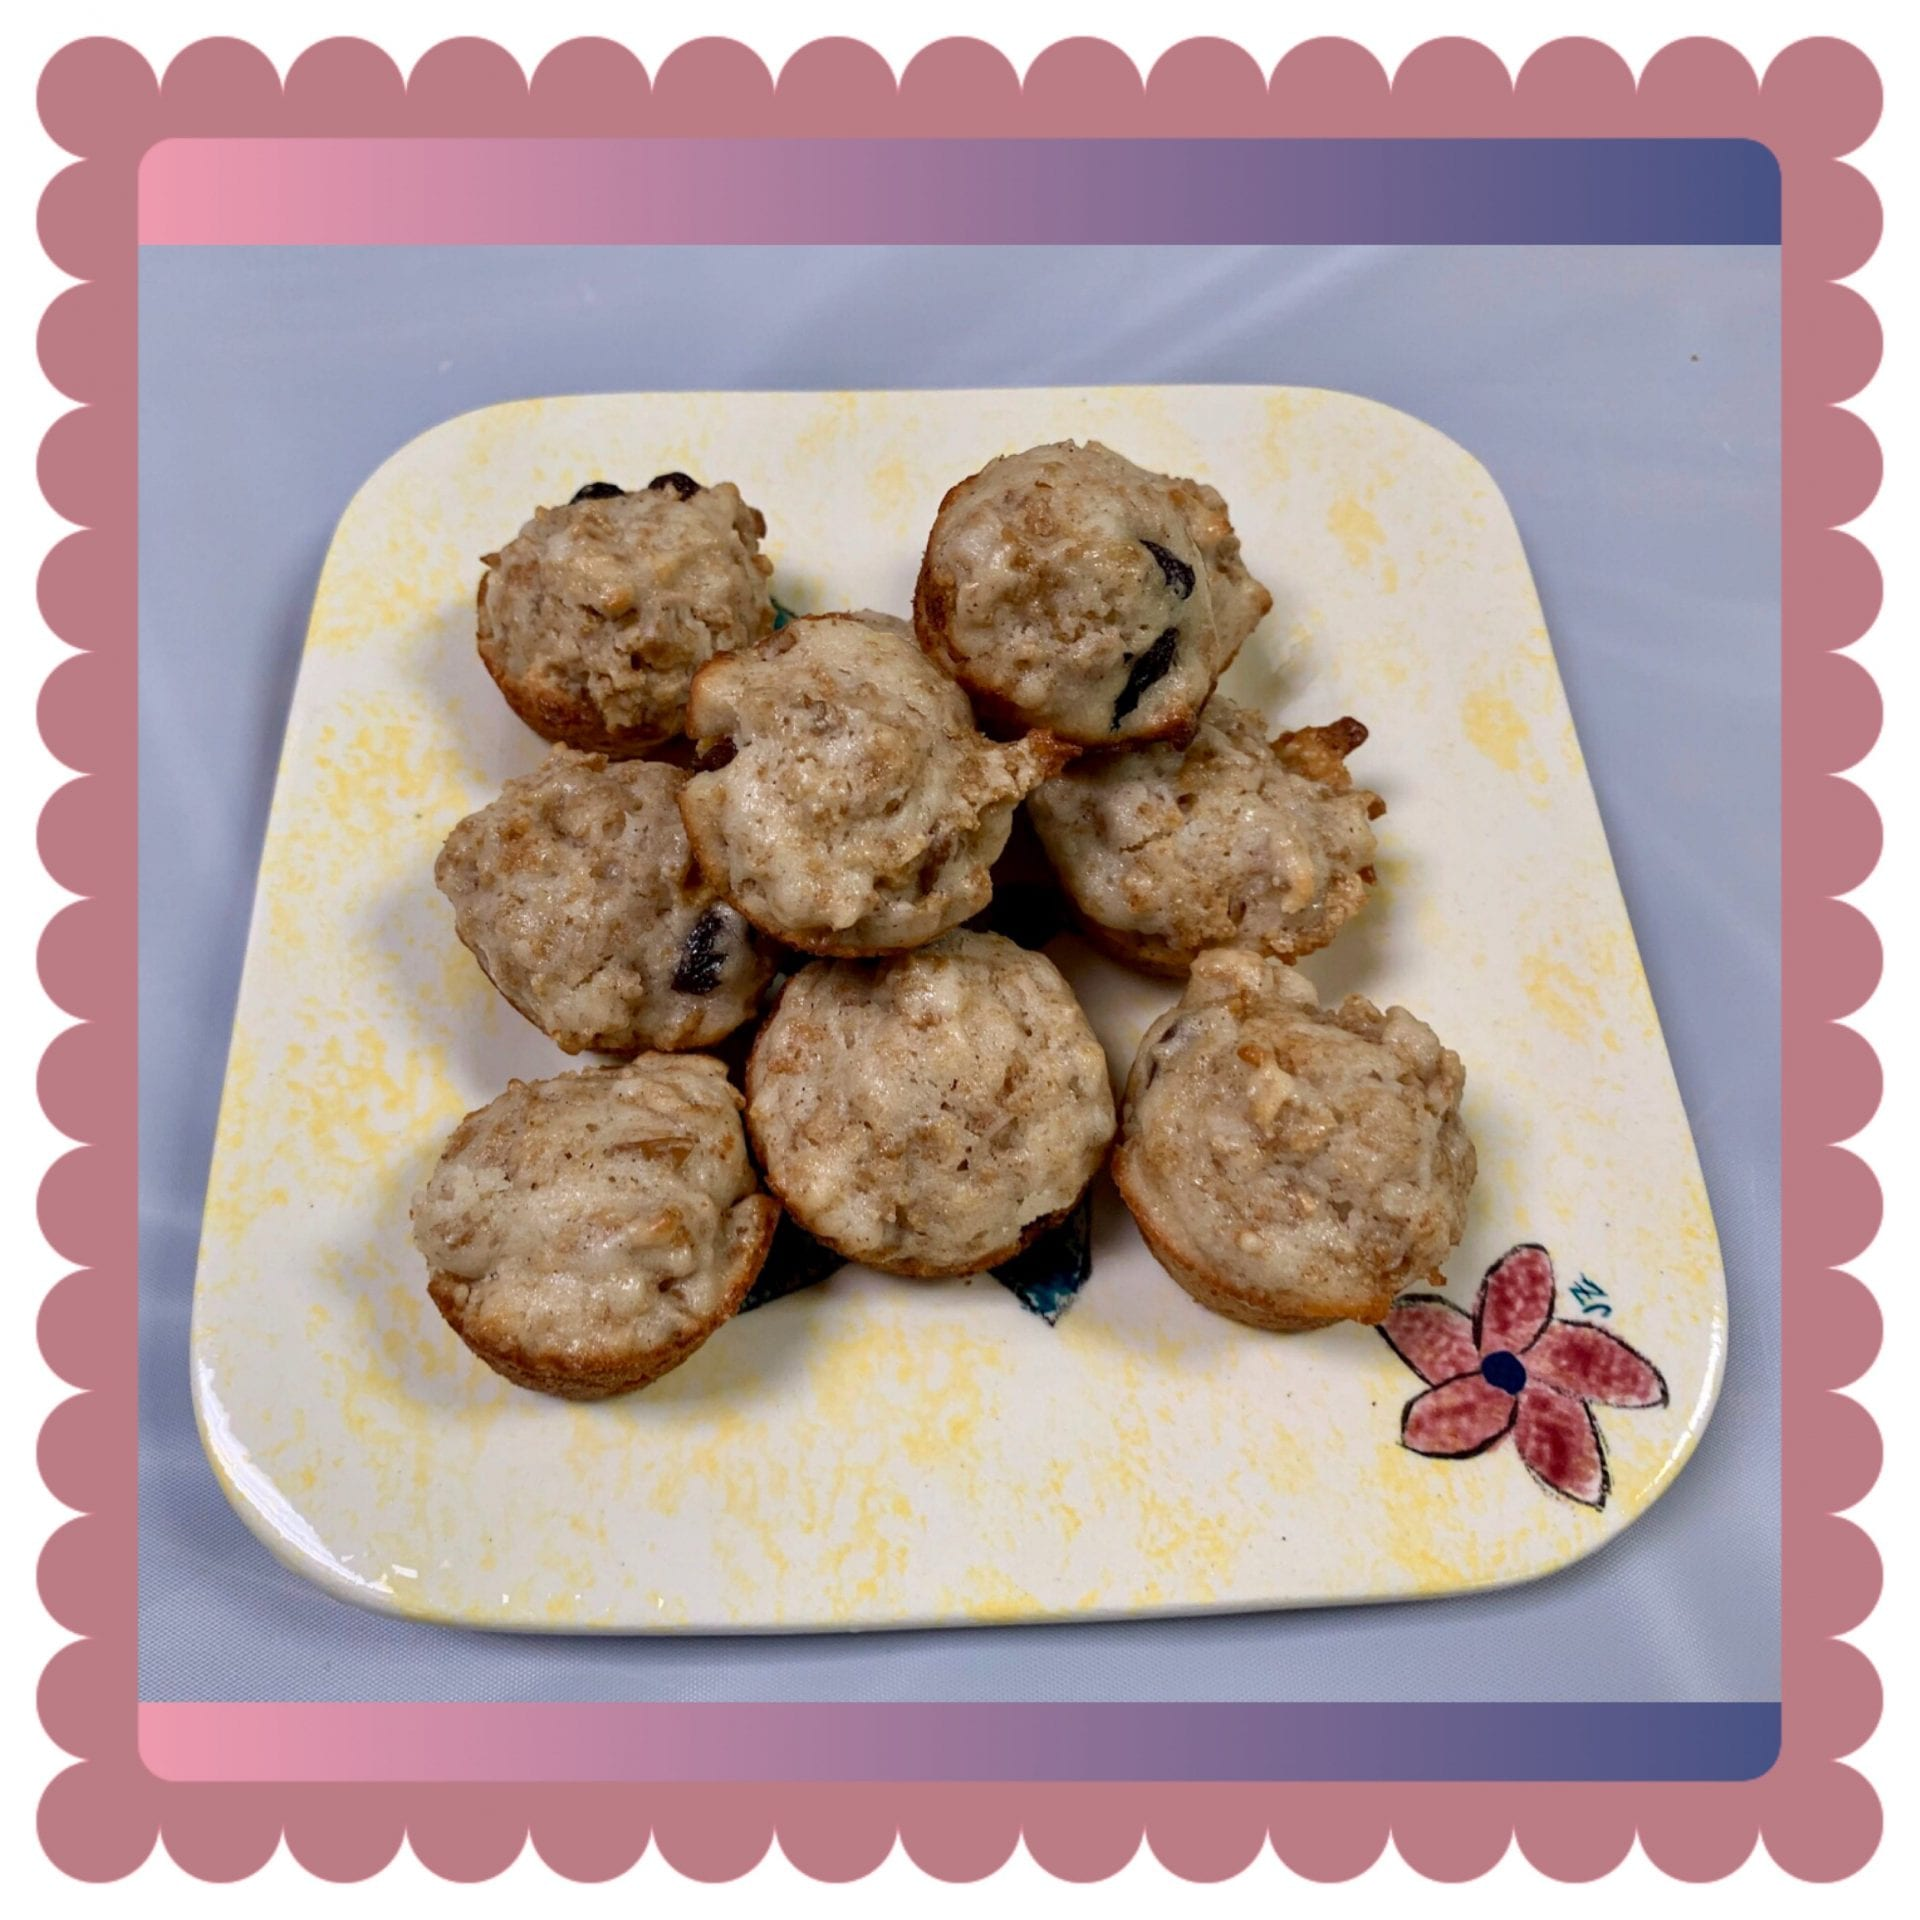 Linda's Raisin Bran muffins